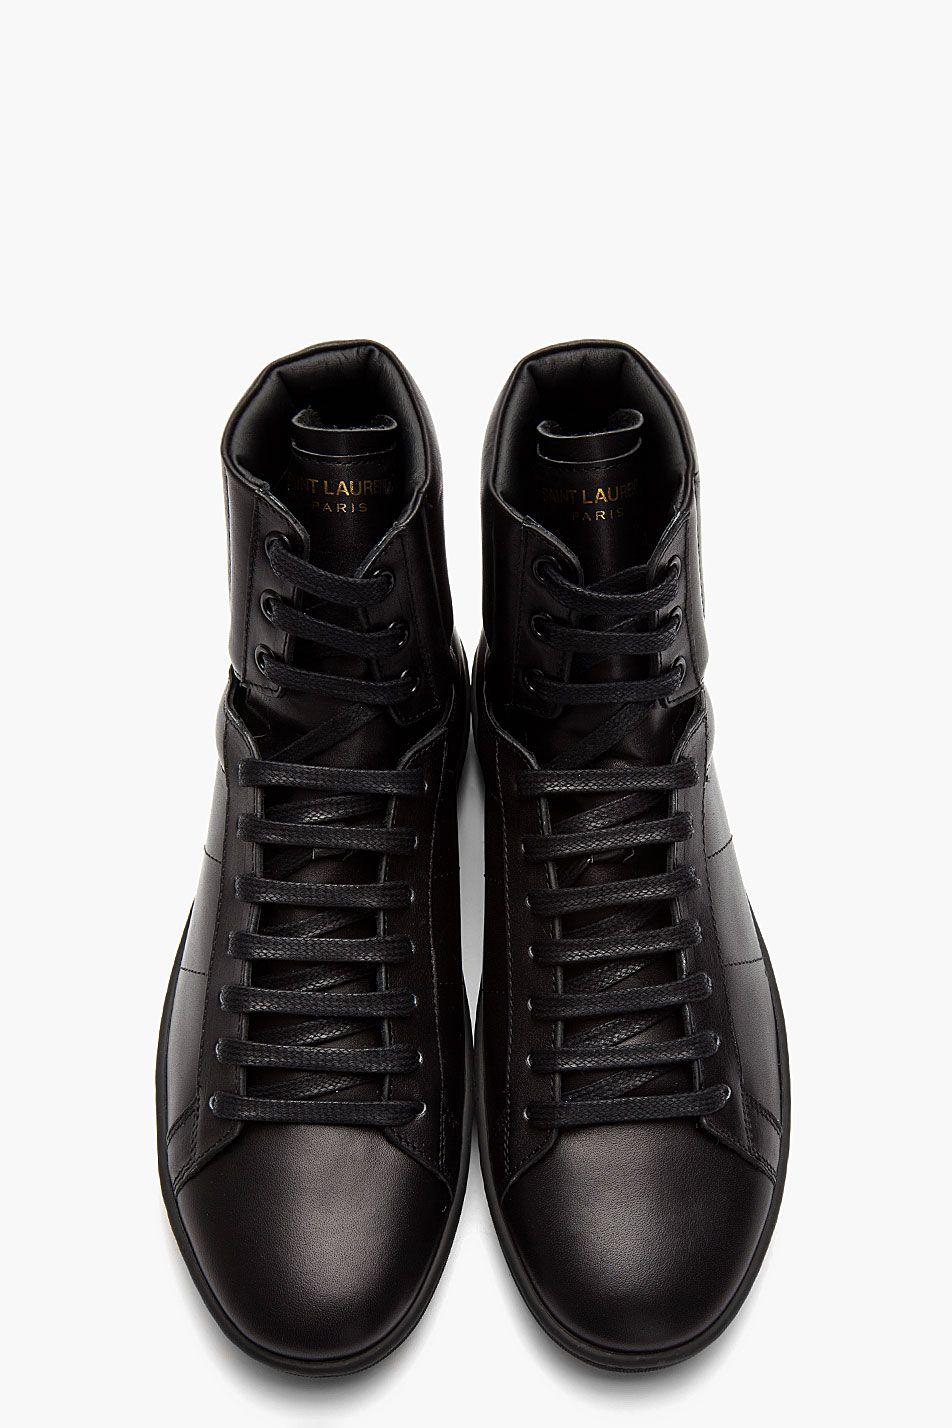 SAINT LAURENT // Black Classic Leather high-Top sneakers 31418M050001 High  top leather sneakers